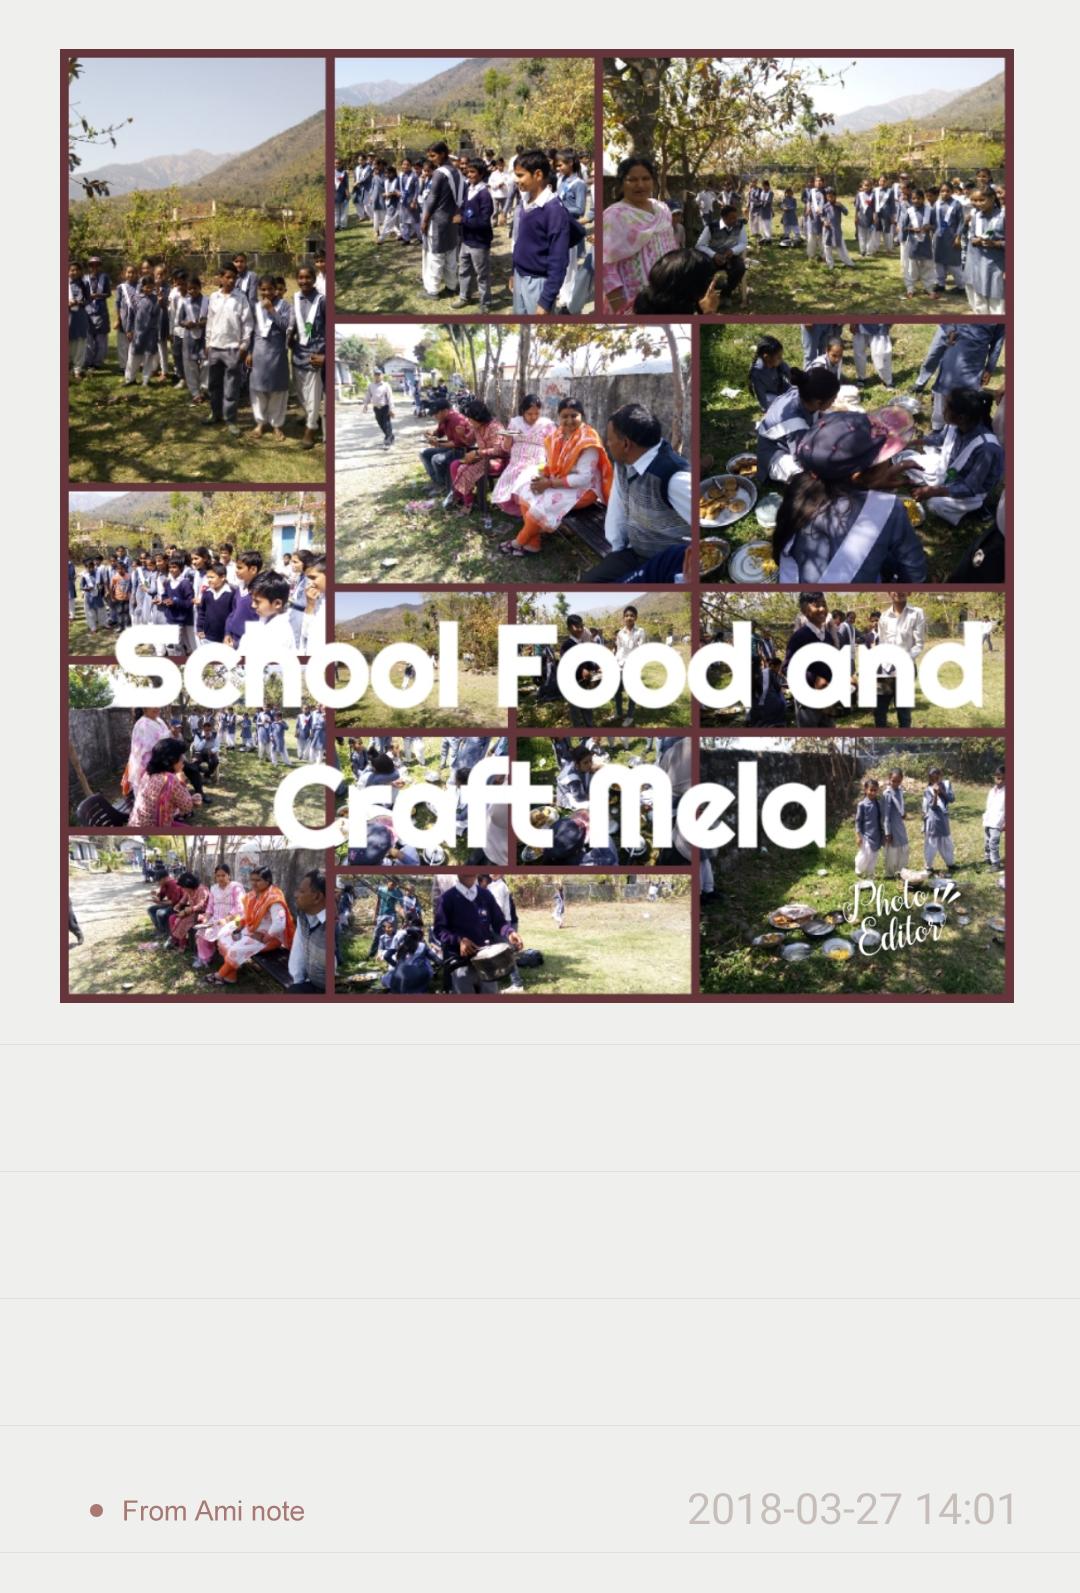 GIC MISRAS DEHRADUN: FOOD AND CRAFT MELA IN JUNIOR SCHOOL